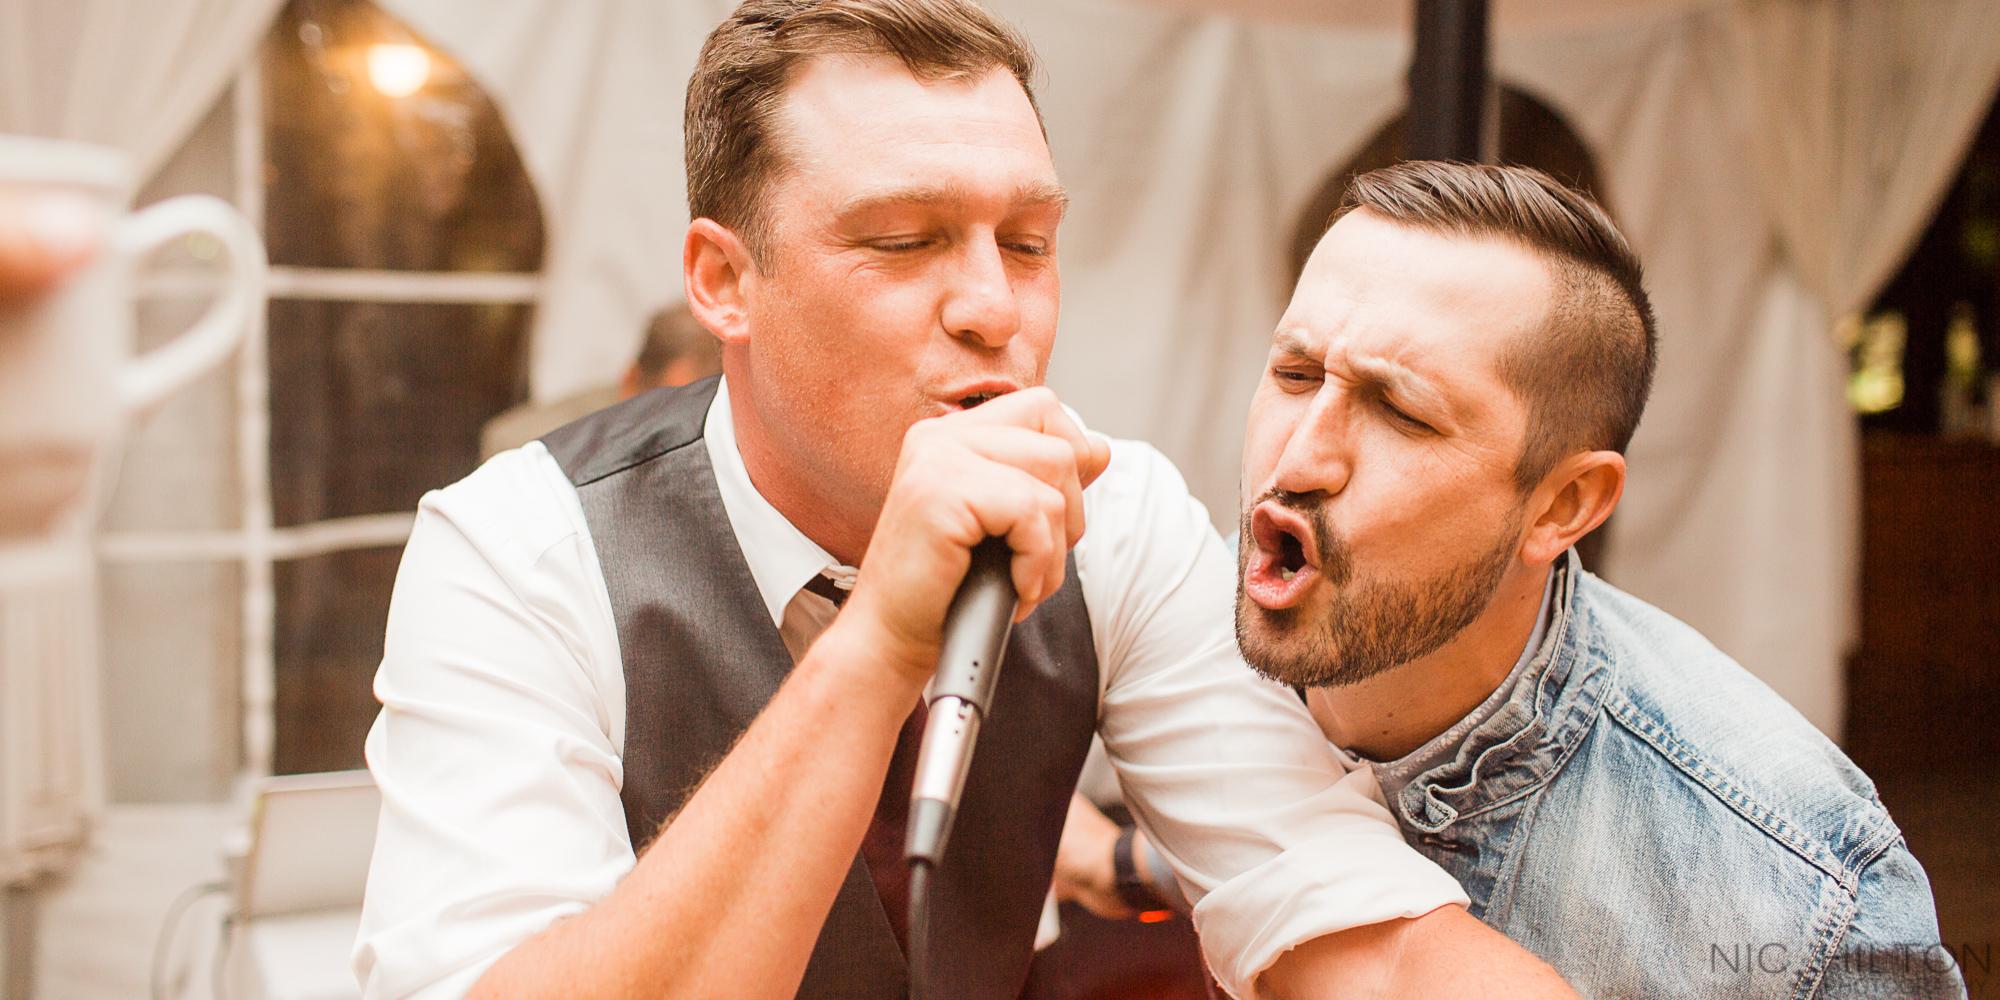 Vanilla-Ice-Rap-Double-Eagle-Wedding.jpg